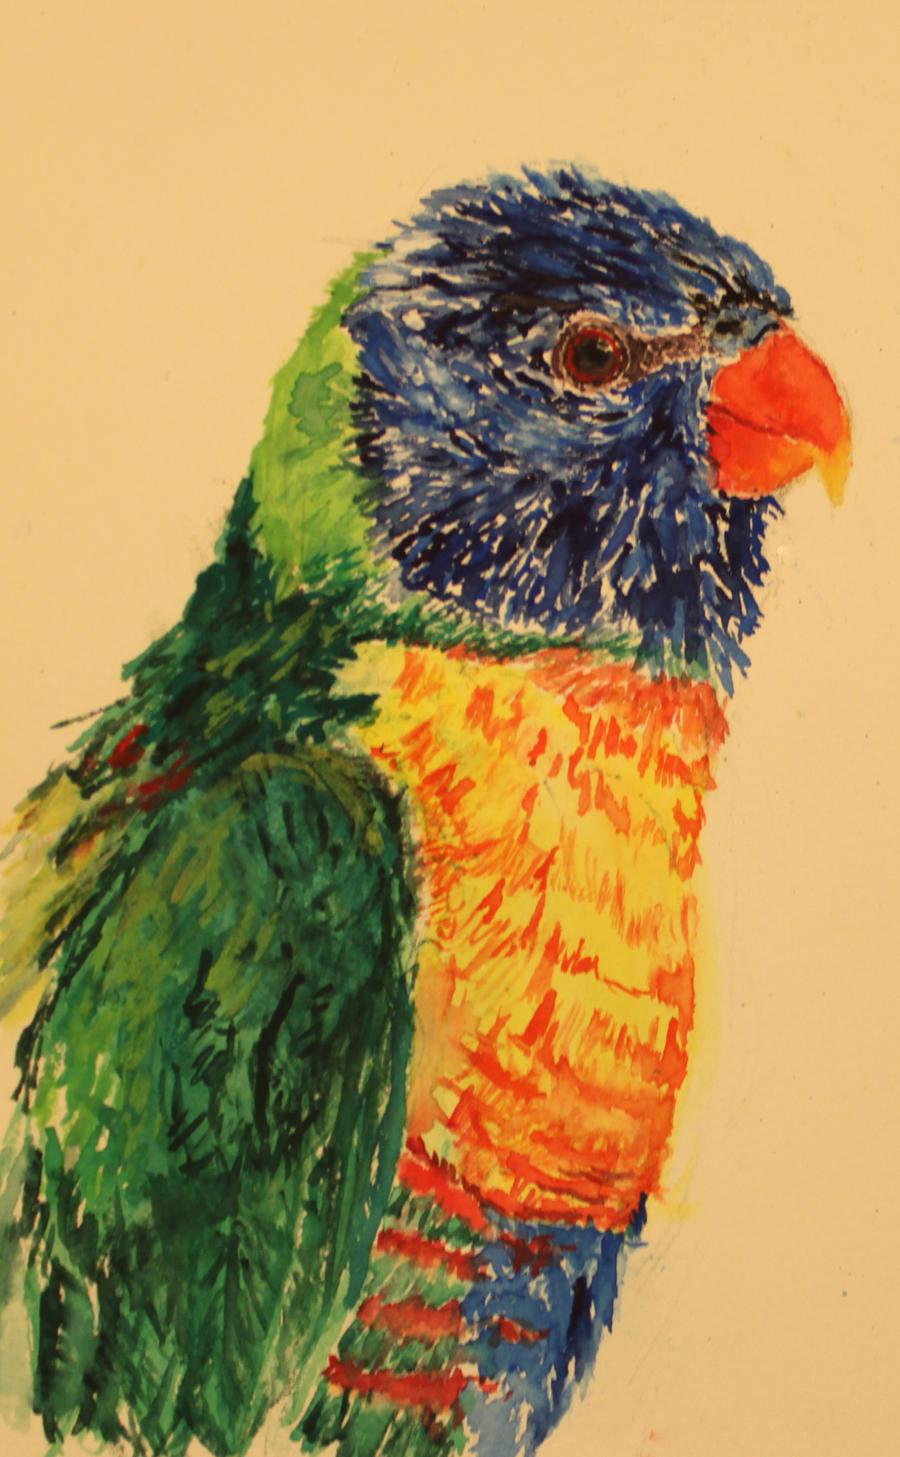 Mr. Rainbow feathers by ezliribs-apprentice